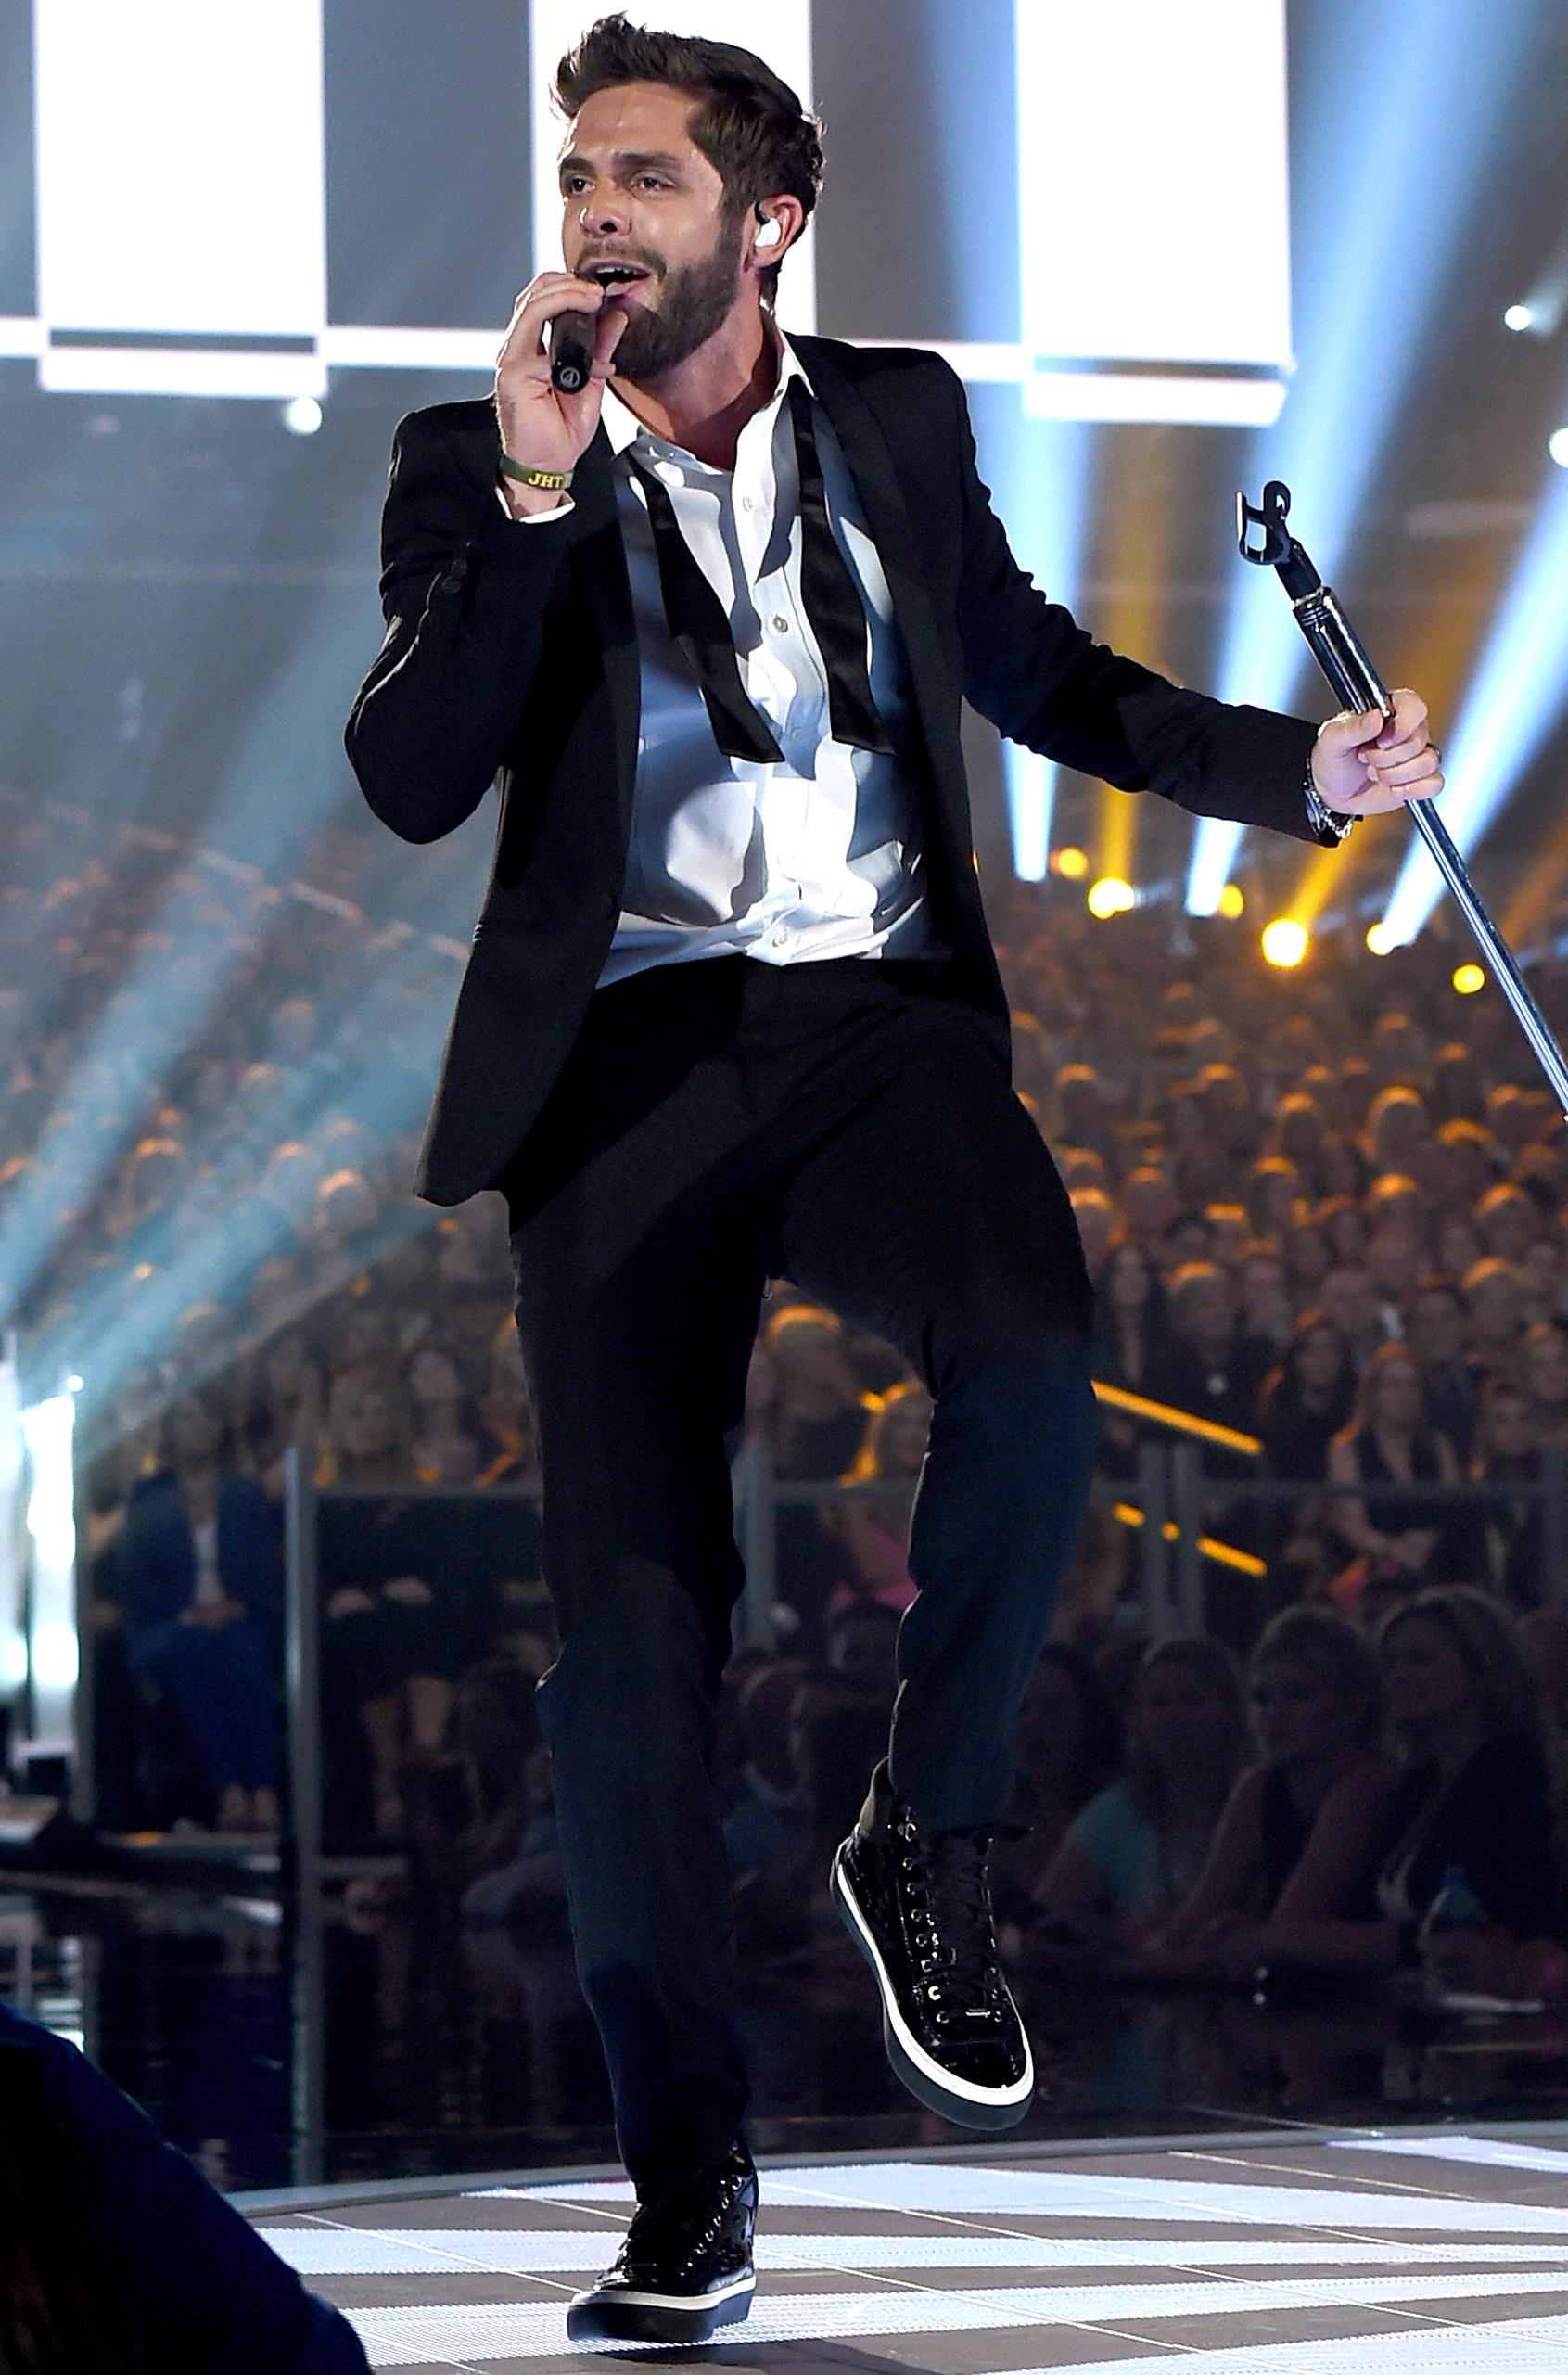 Thomas Rhett: Inside a Country Star's Soul Reinvention